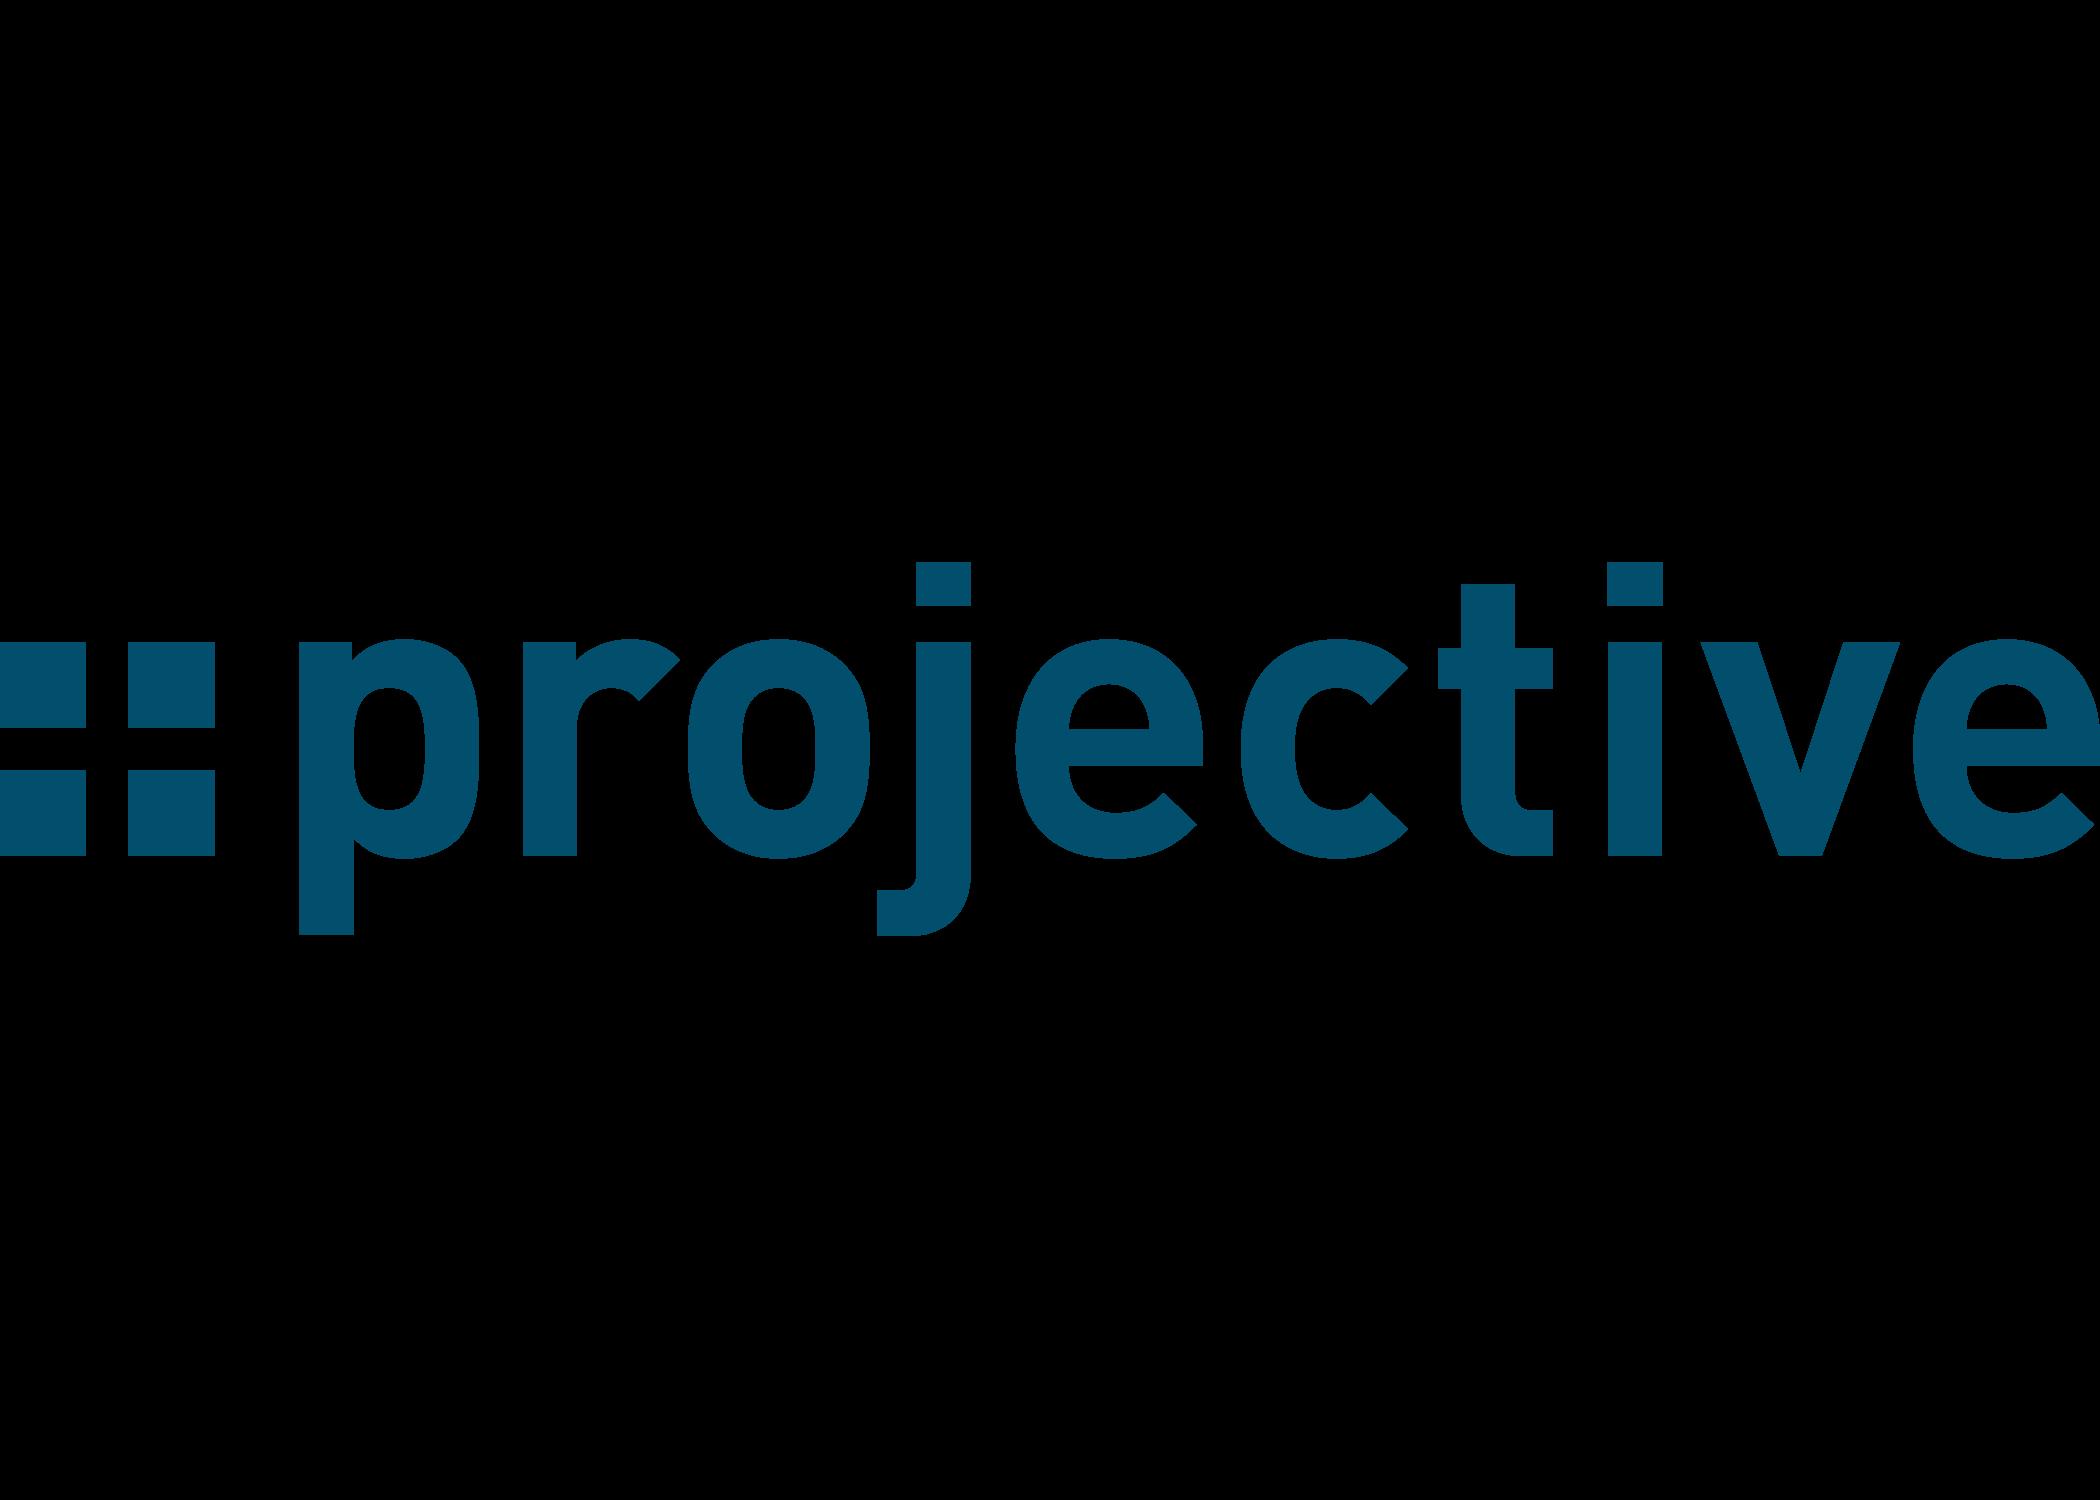 Projective London Ltd